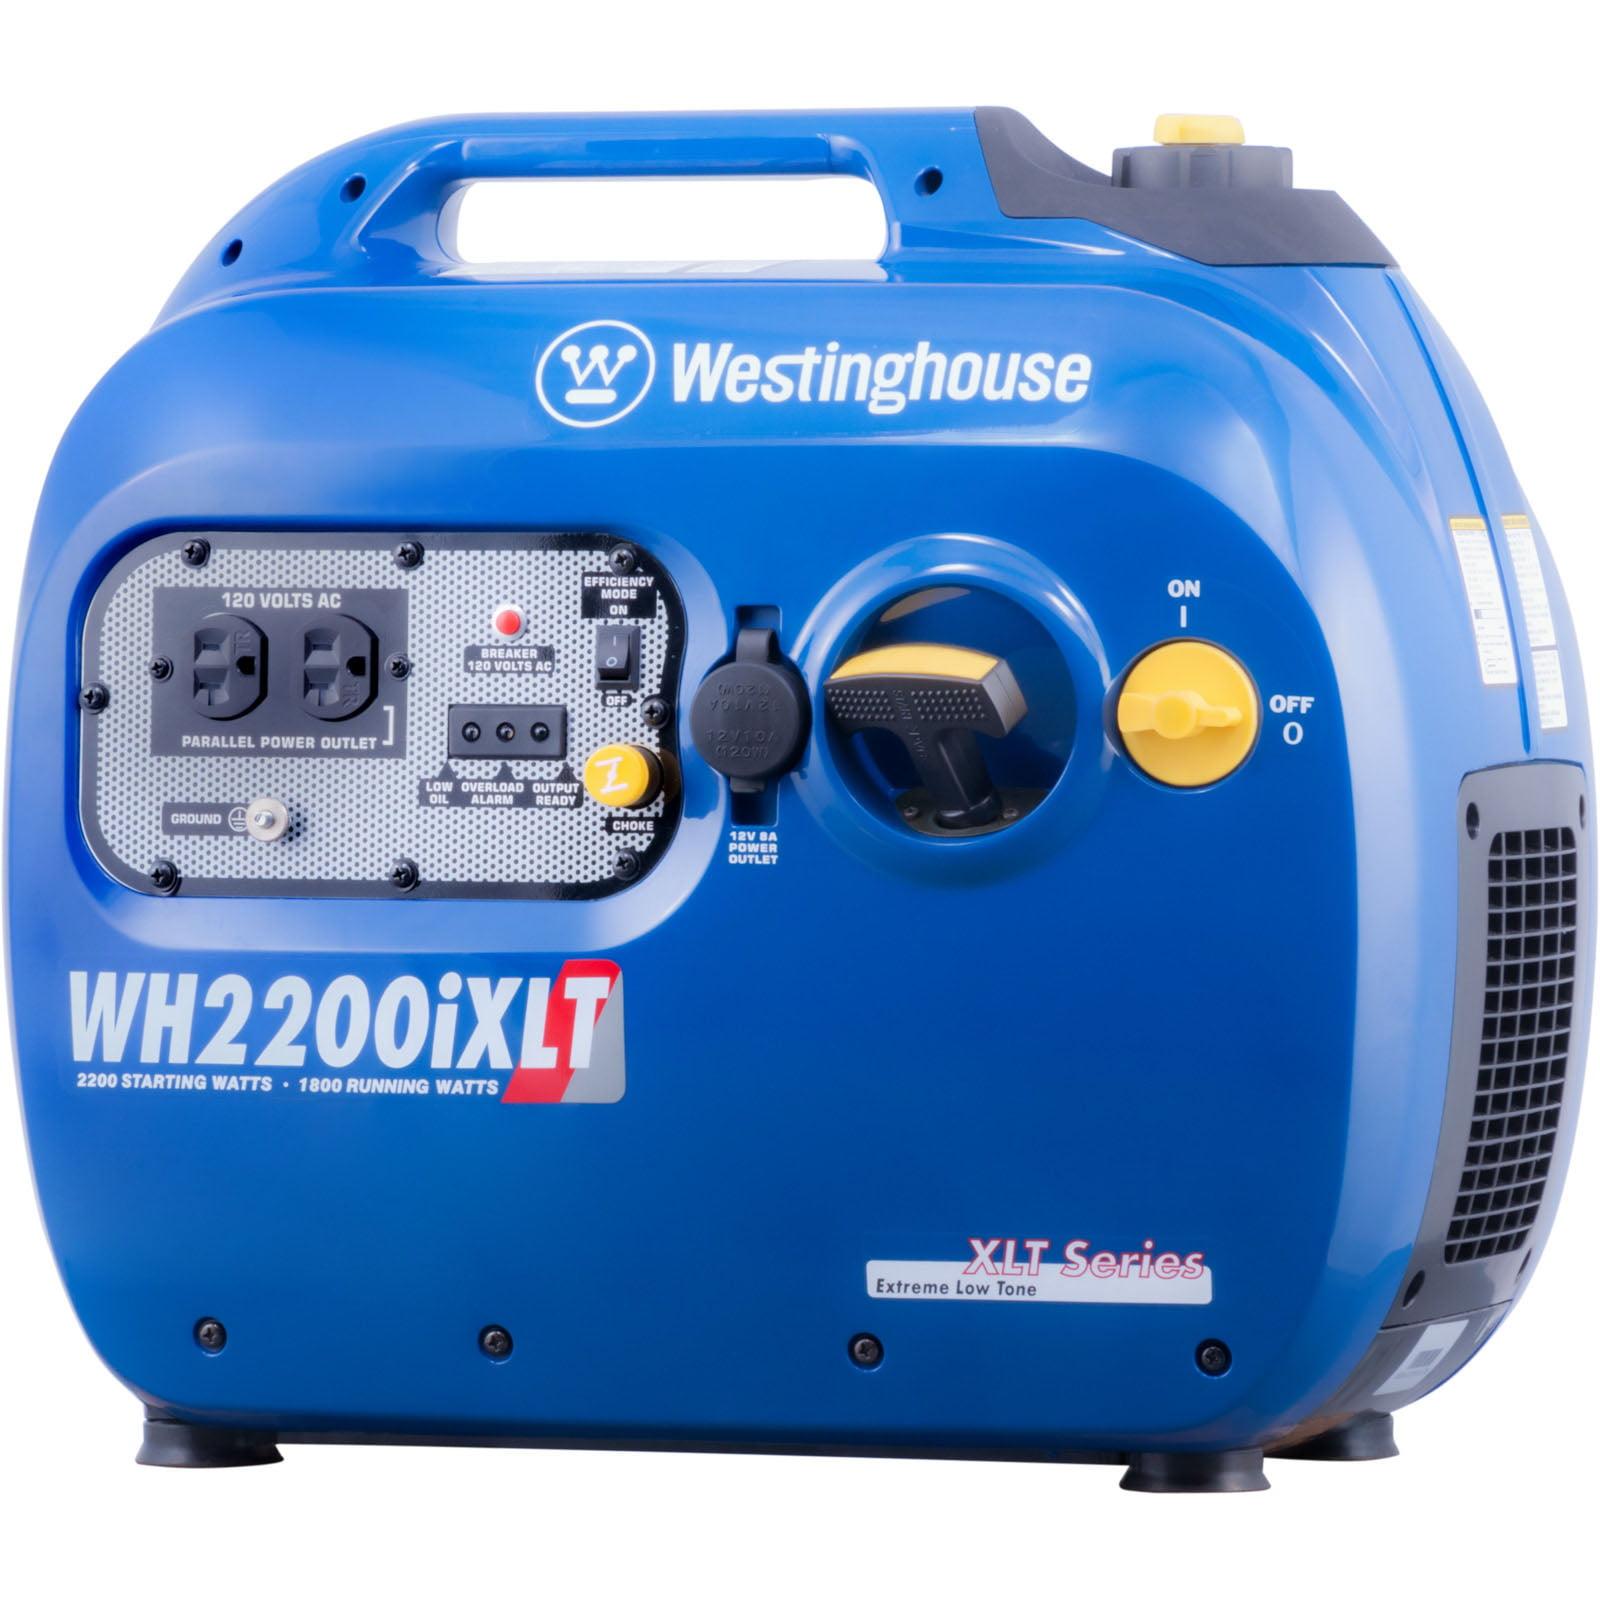 2200 Watt Peak 1800 Watt Running Gasoline Powered Digital Inverter Generator with Parallel Capabilities